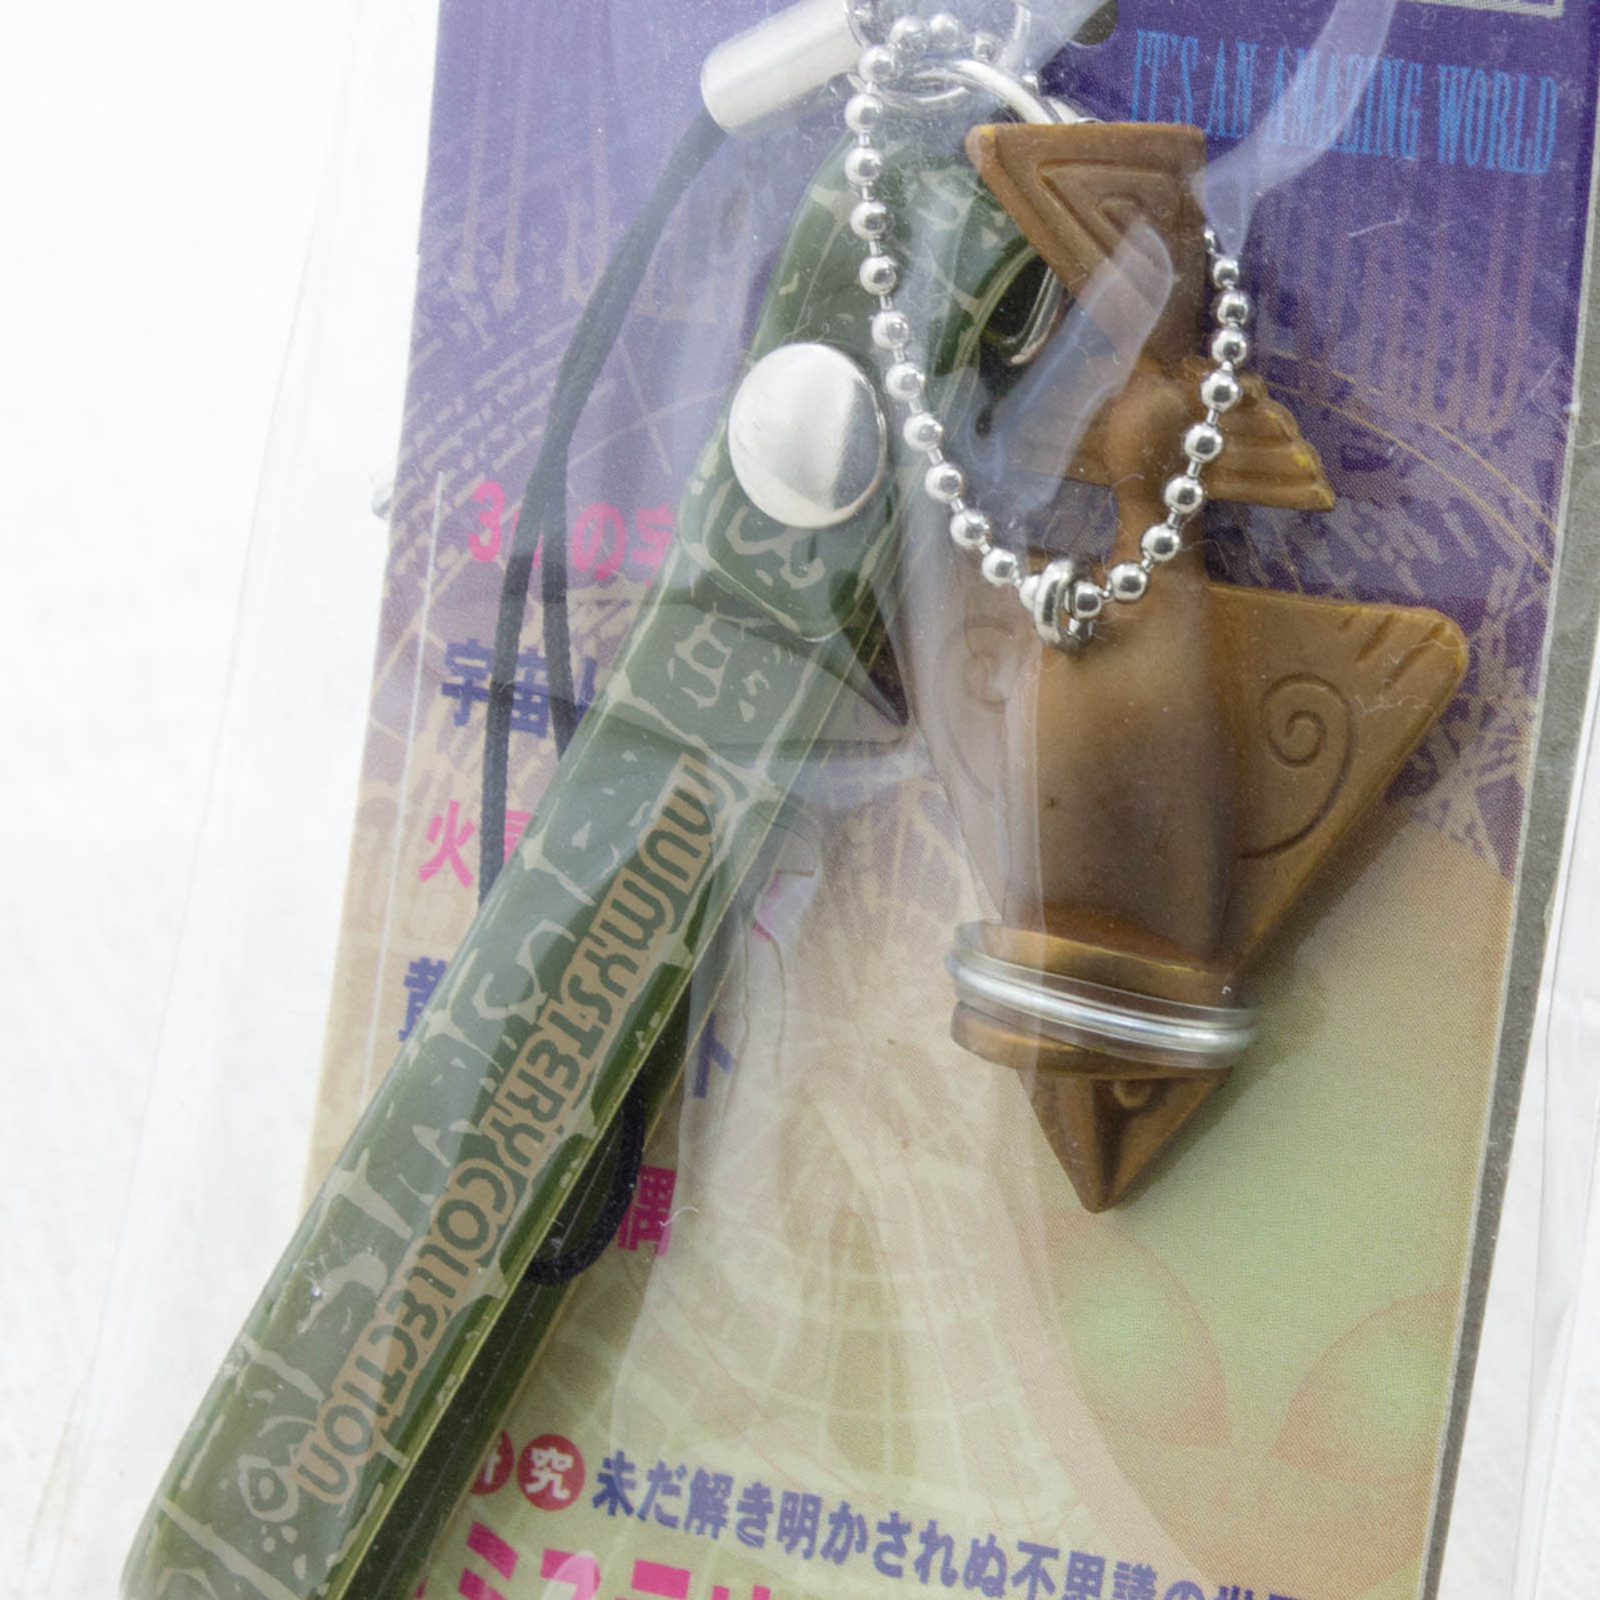 RARE! Quimbaya Artifacts Figure Strap Super Mystery Magazine MU Goods JAPAN SEGA